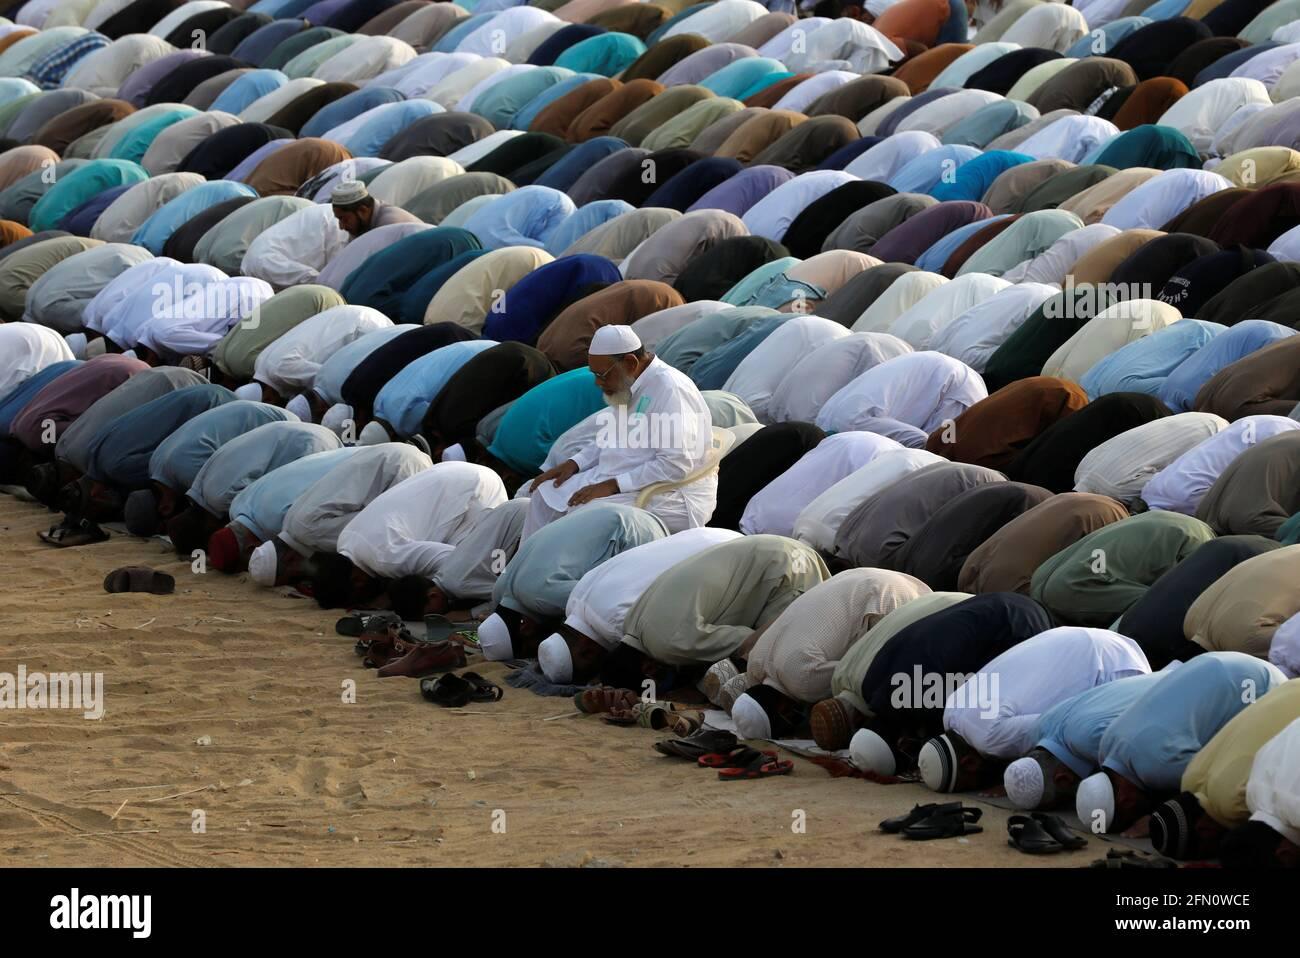 Pakistanische Muslime feiern Eid al-Fitr-Gebete zum Ende des Fastenmonats Ramadan, da der Ausbruch der Coronavirus-Krankheit (COVID-19) in Karachi, Pakistan, am 13. Mai 2021 andauert. REUTERS/Akhtar Soomro Stockfoto